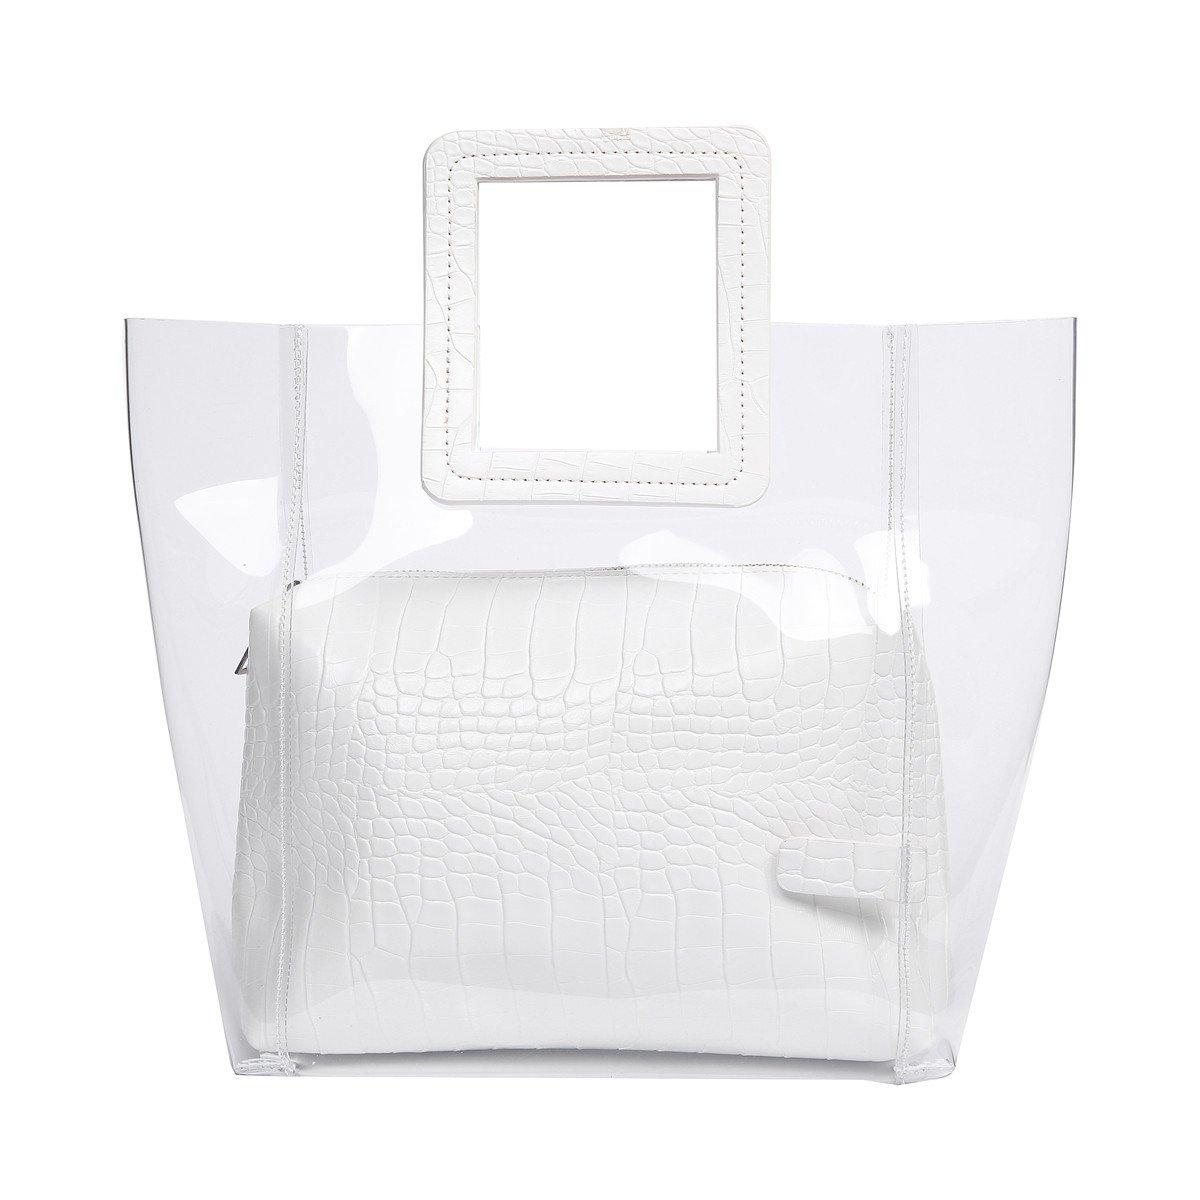 FANCY LOVE Classy Waterprof Clear Tote Beach Shoulder Crossbody Bag (White)